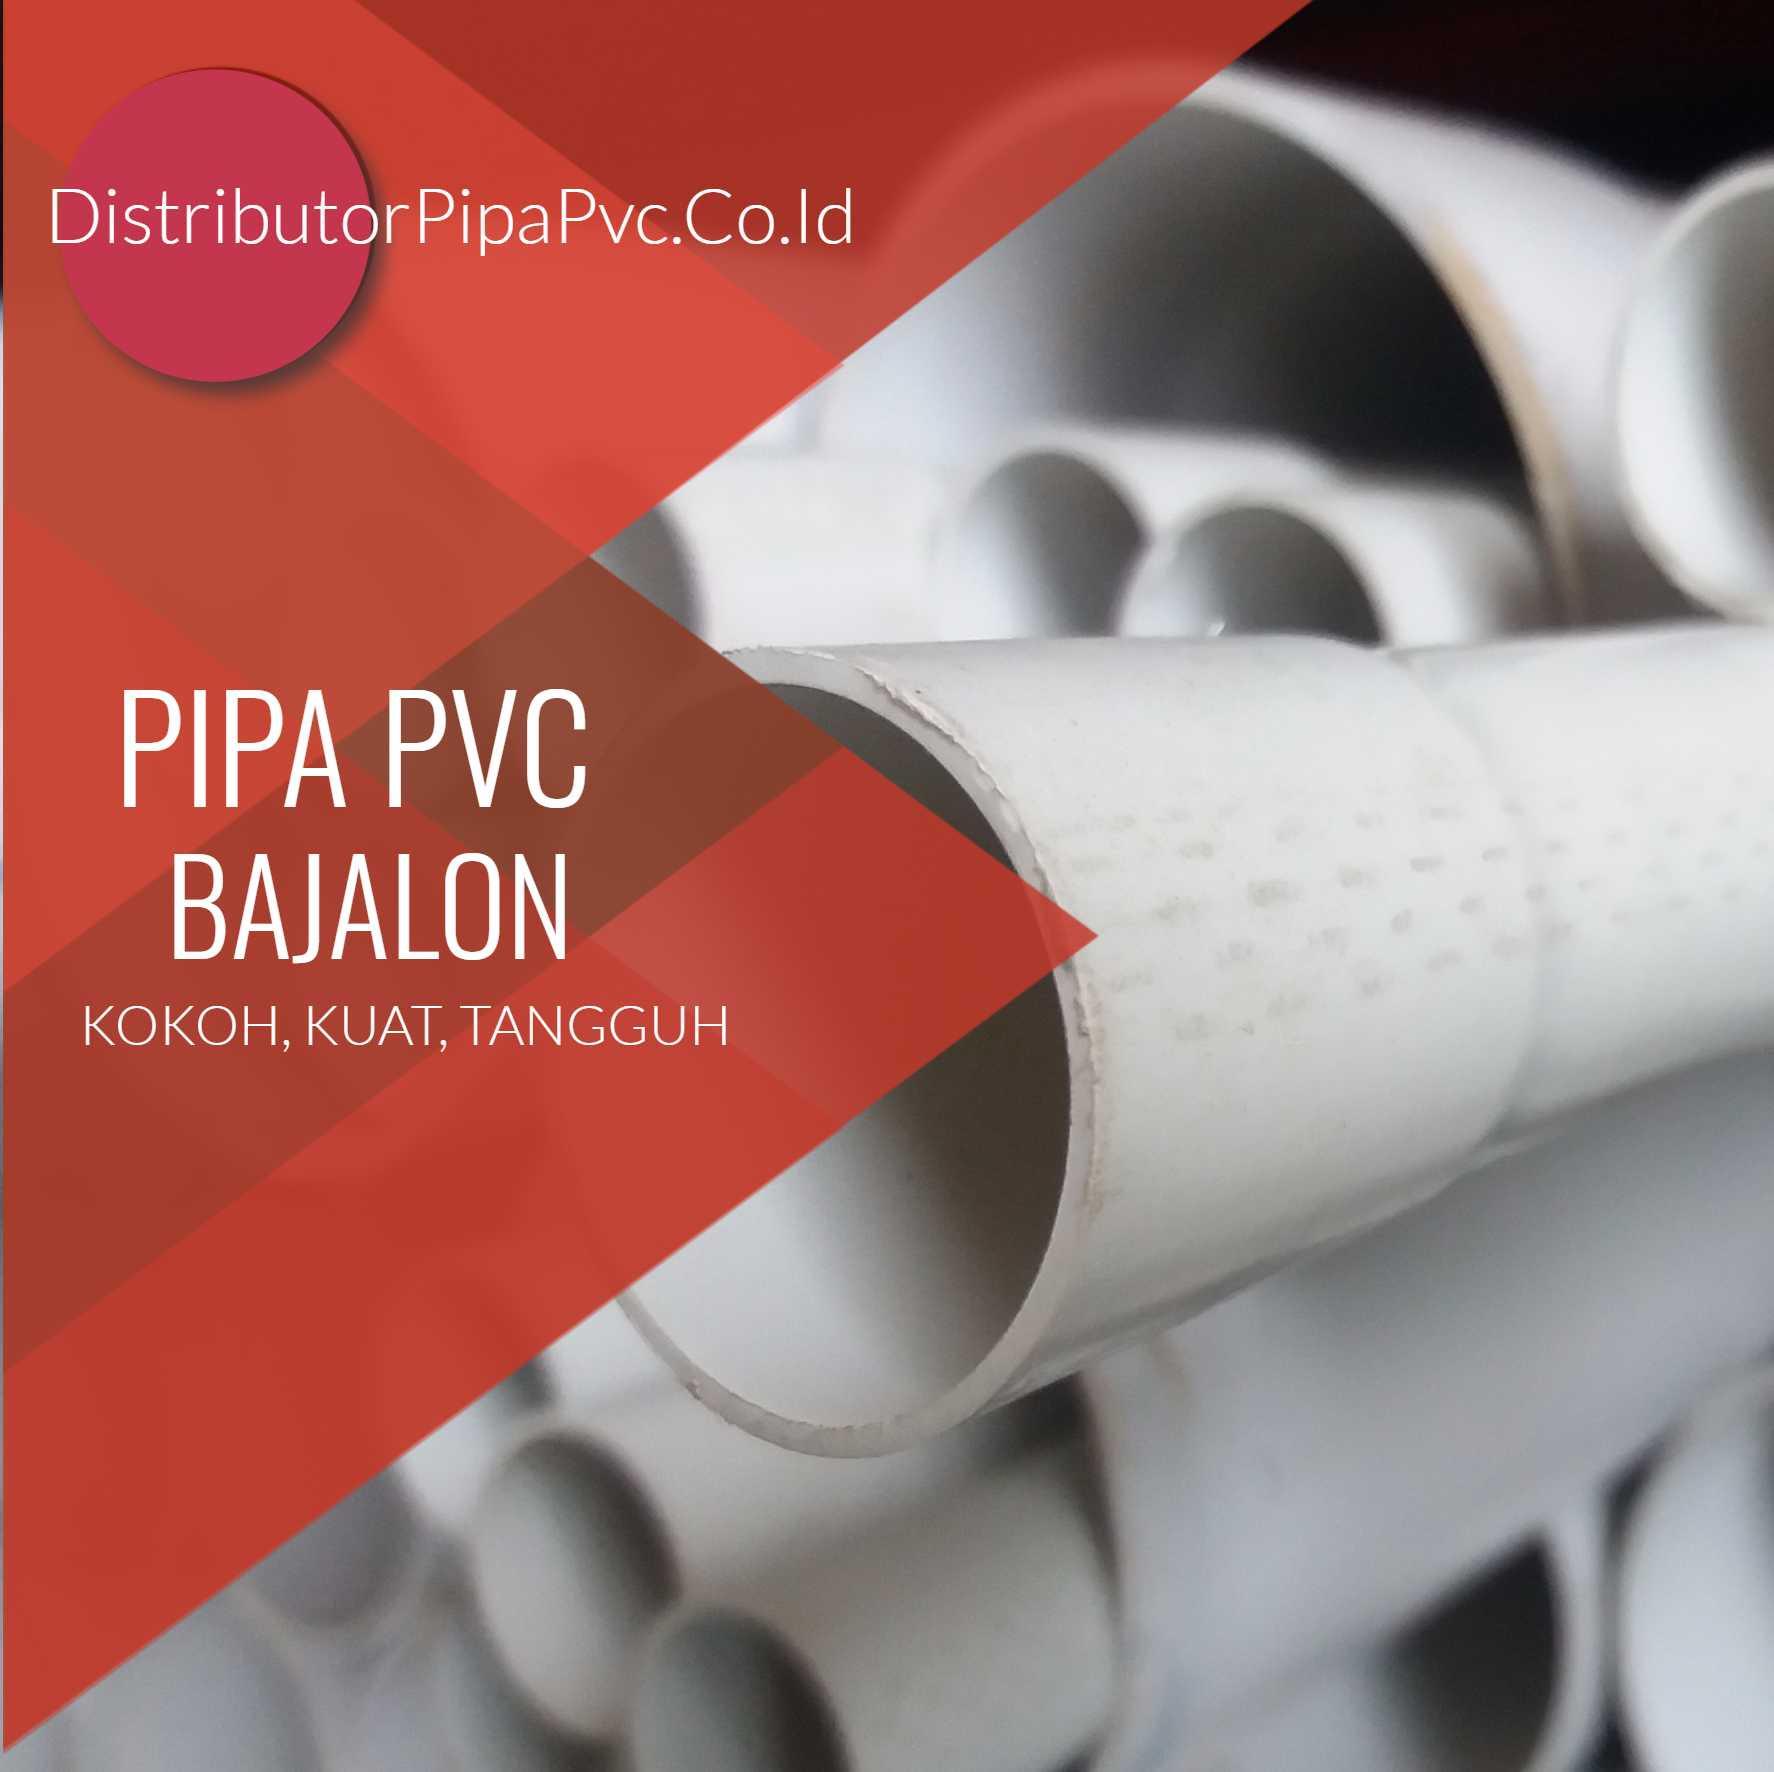 Harga Pipa Paralon Murah Distributor Pipa PVC